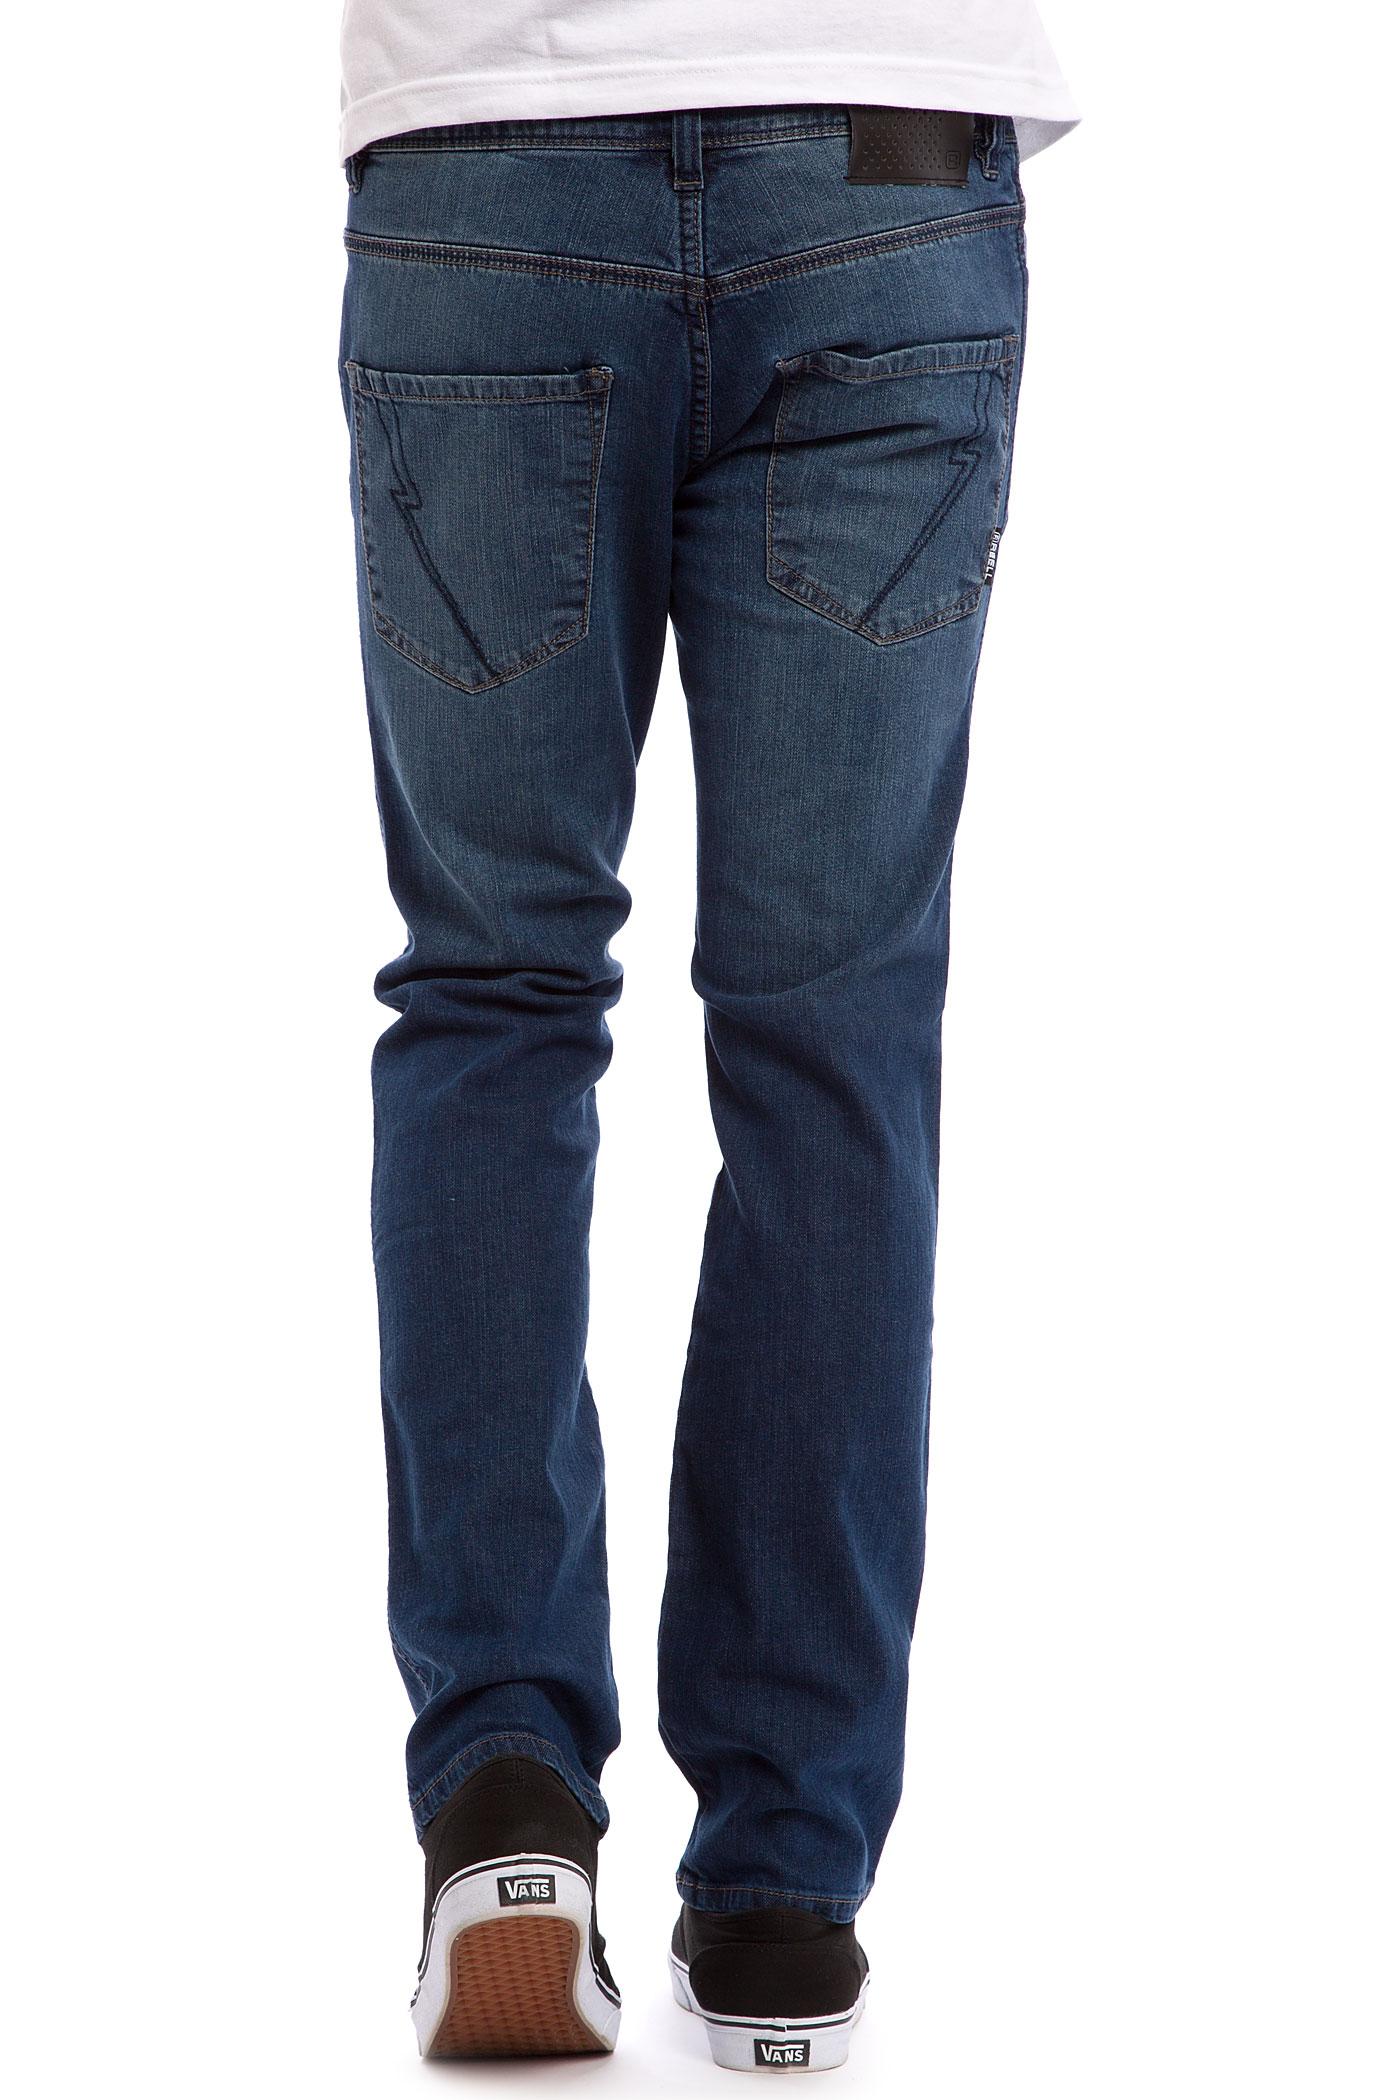 REELL Razor Jeans (sapphire blue) kaufen bei skatedeluxe